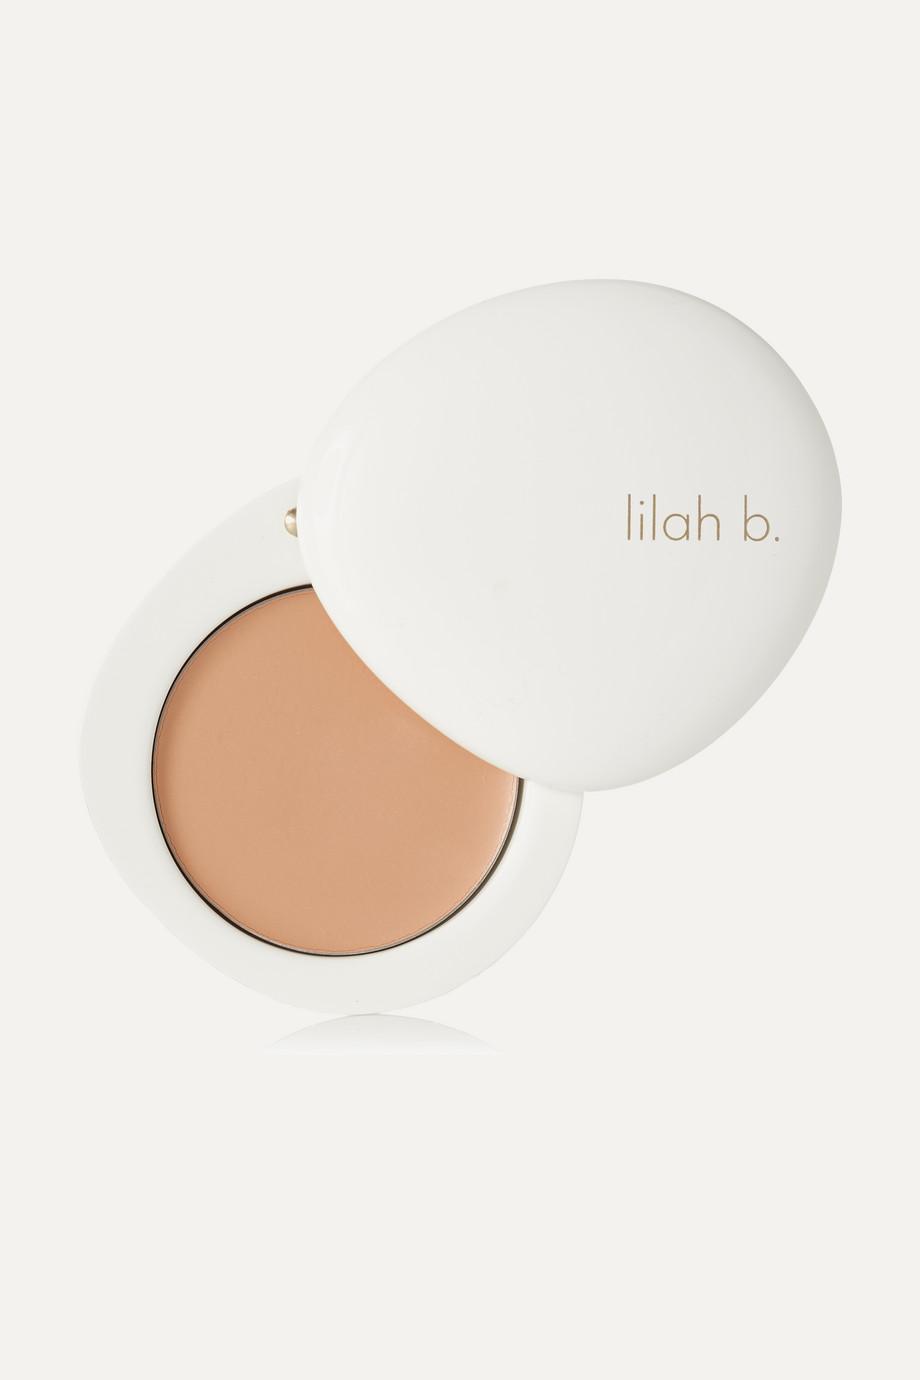 Lilah B. Virtuous Veil™ Concealer & Eye Primer - b.bright